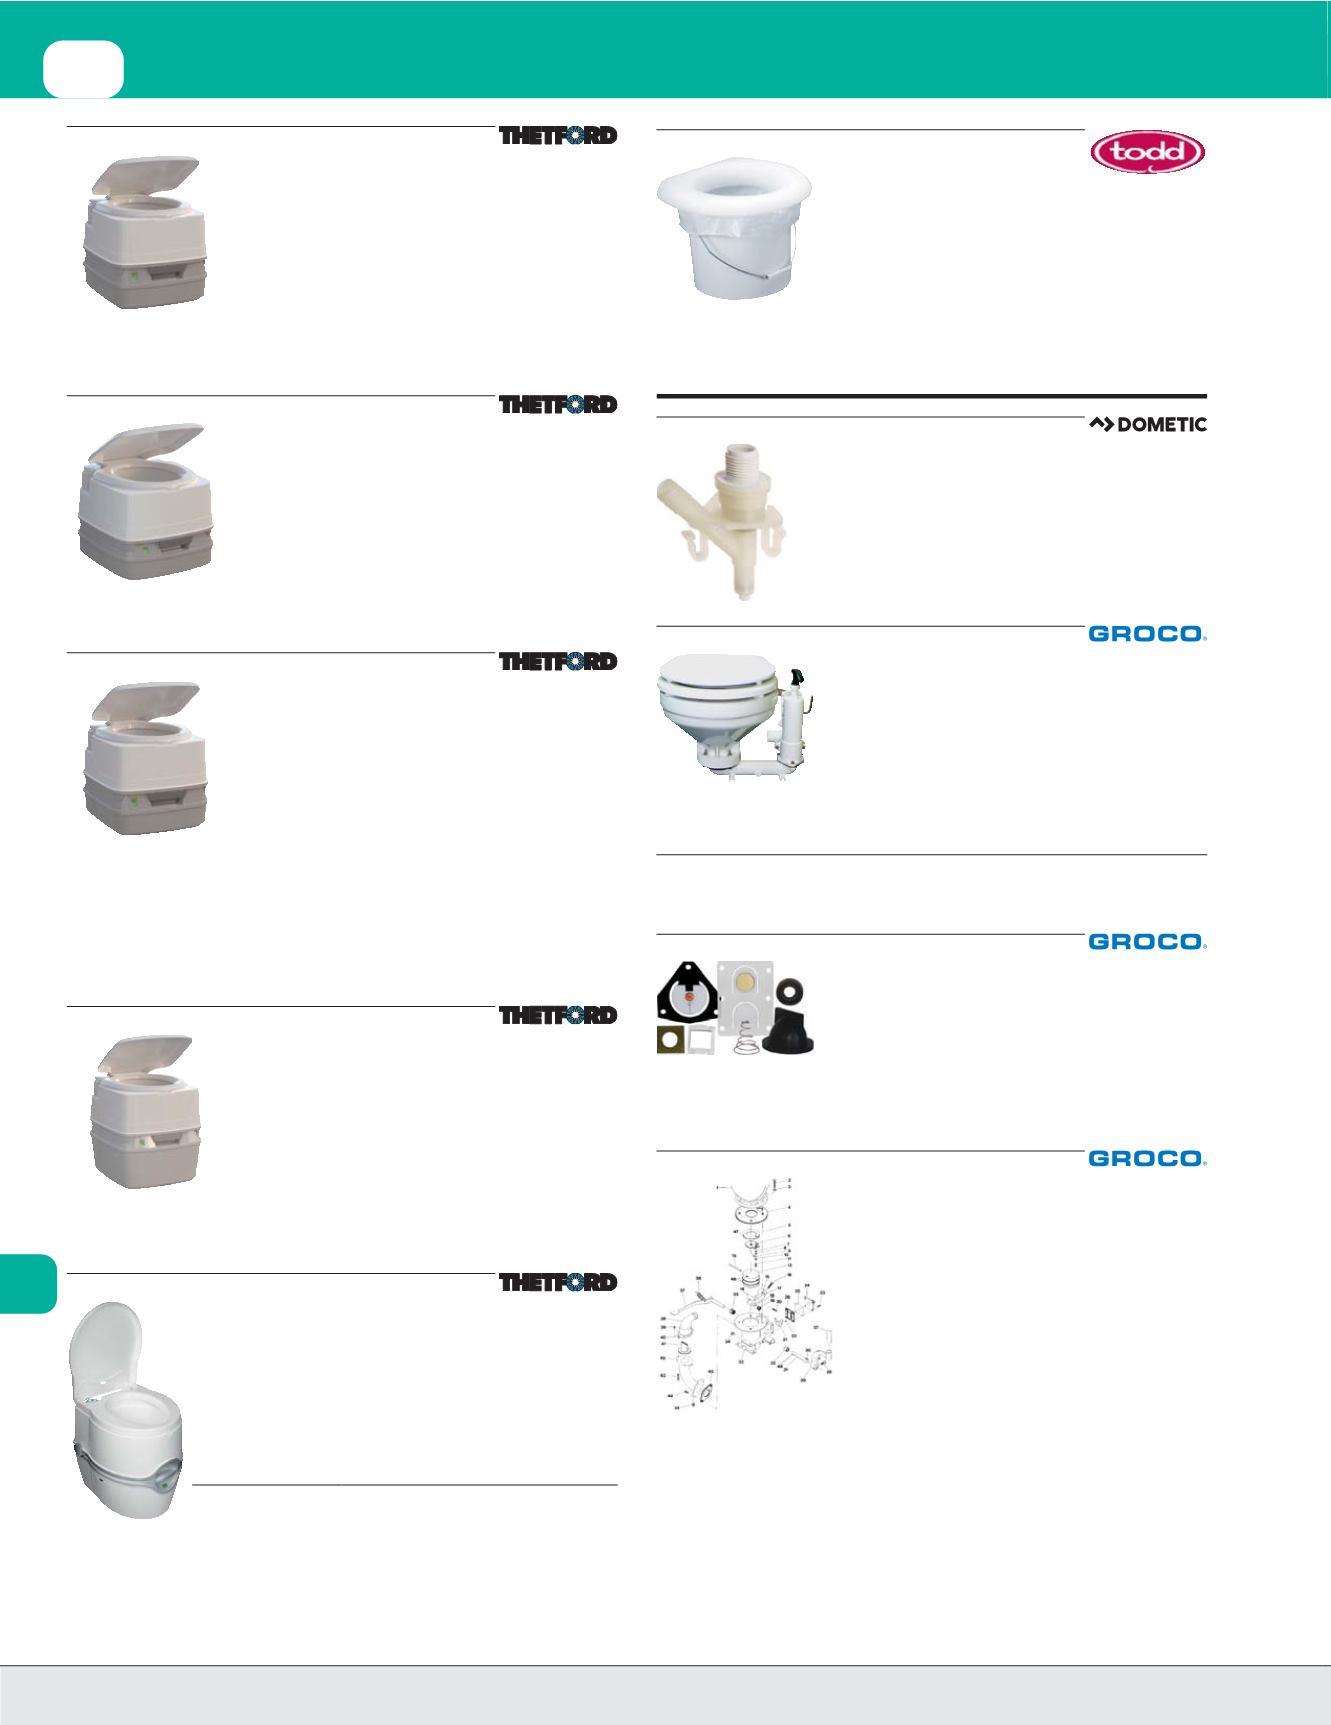 Level Indicator THETFORD MARINE 92865 Thetford Porta Potti 260P Marine Toilet with Piston Pump and Hold-Down Kit